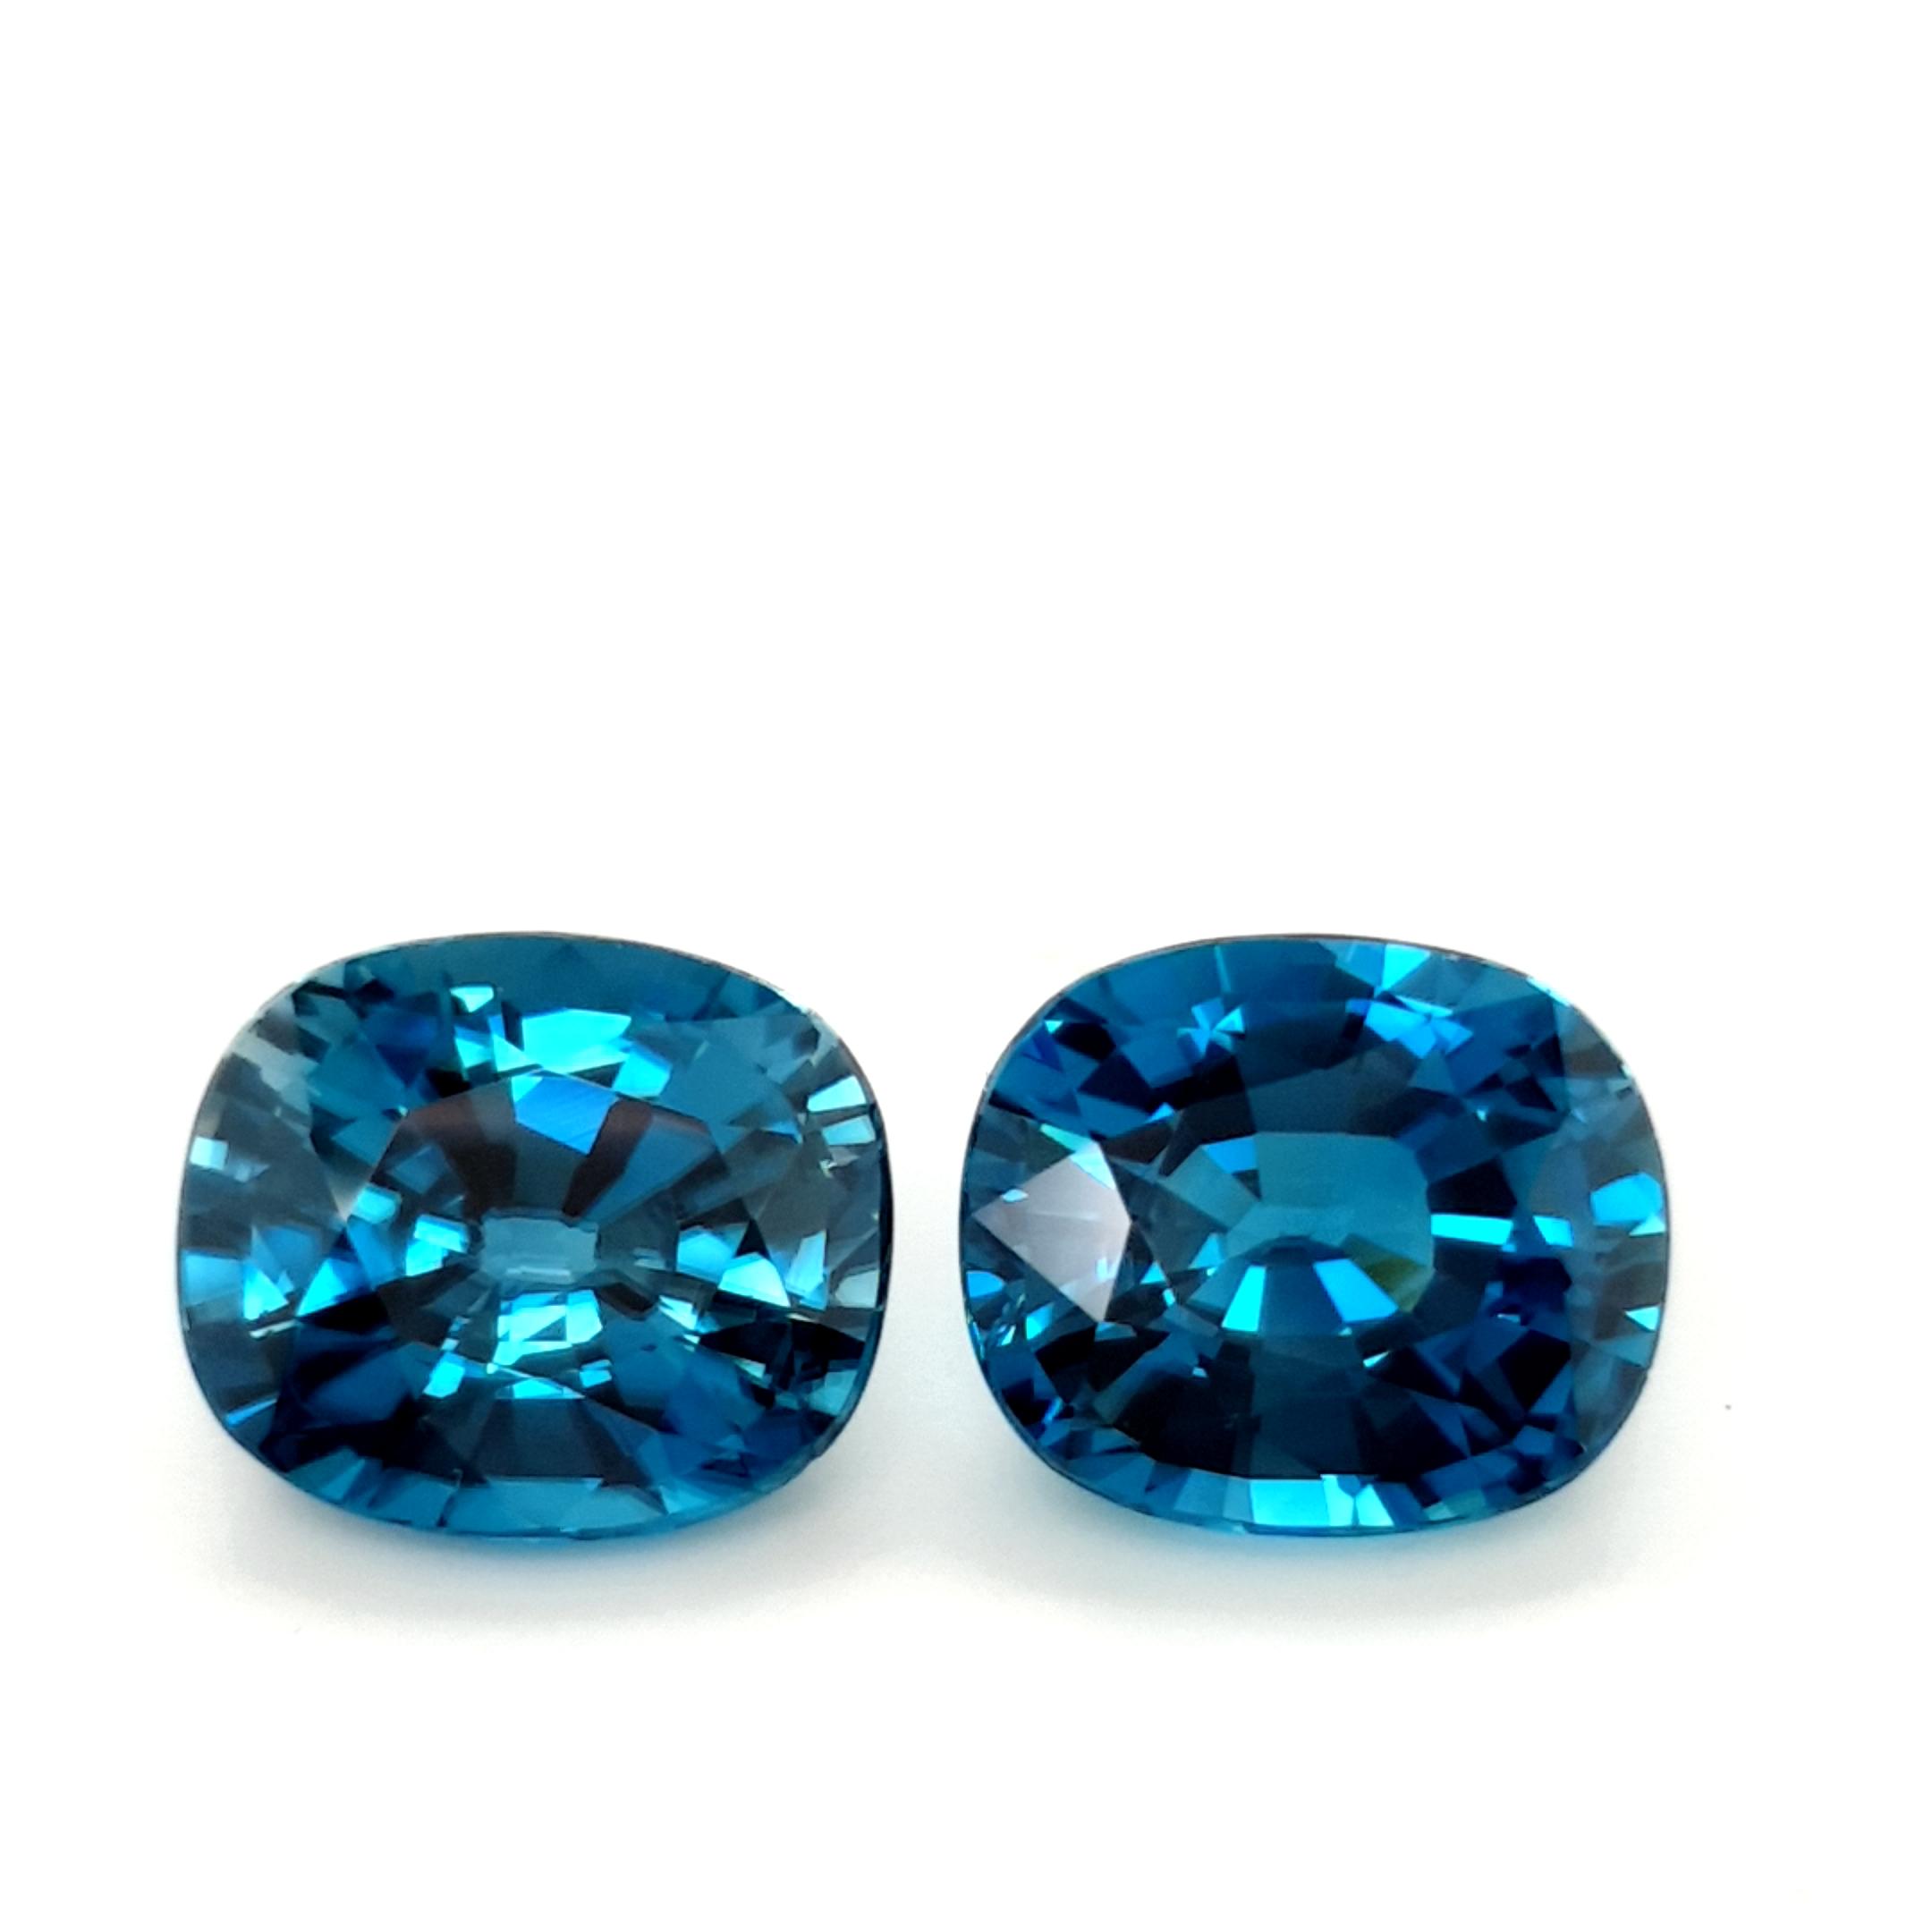 20,63ct. Pair Starlight Blue Zircon ZCK16D12 ClaudiaHamann__2021-04-15-10-50-59